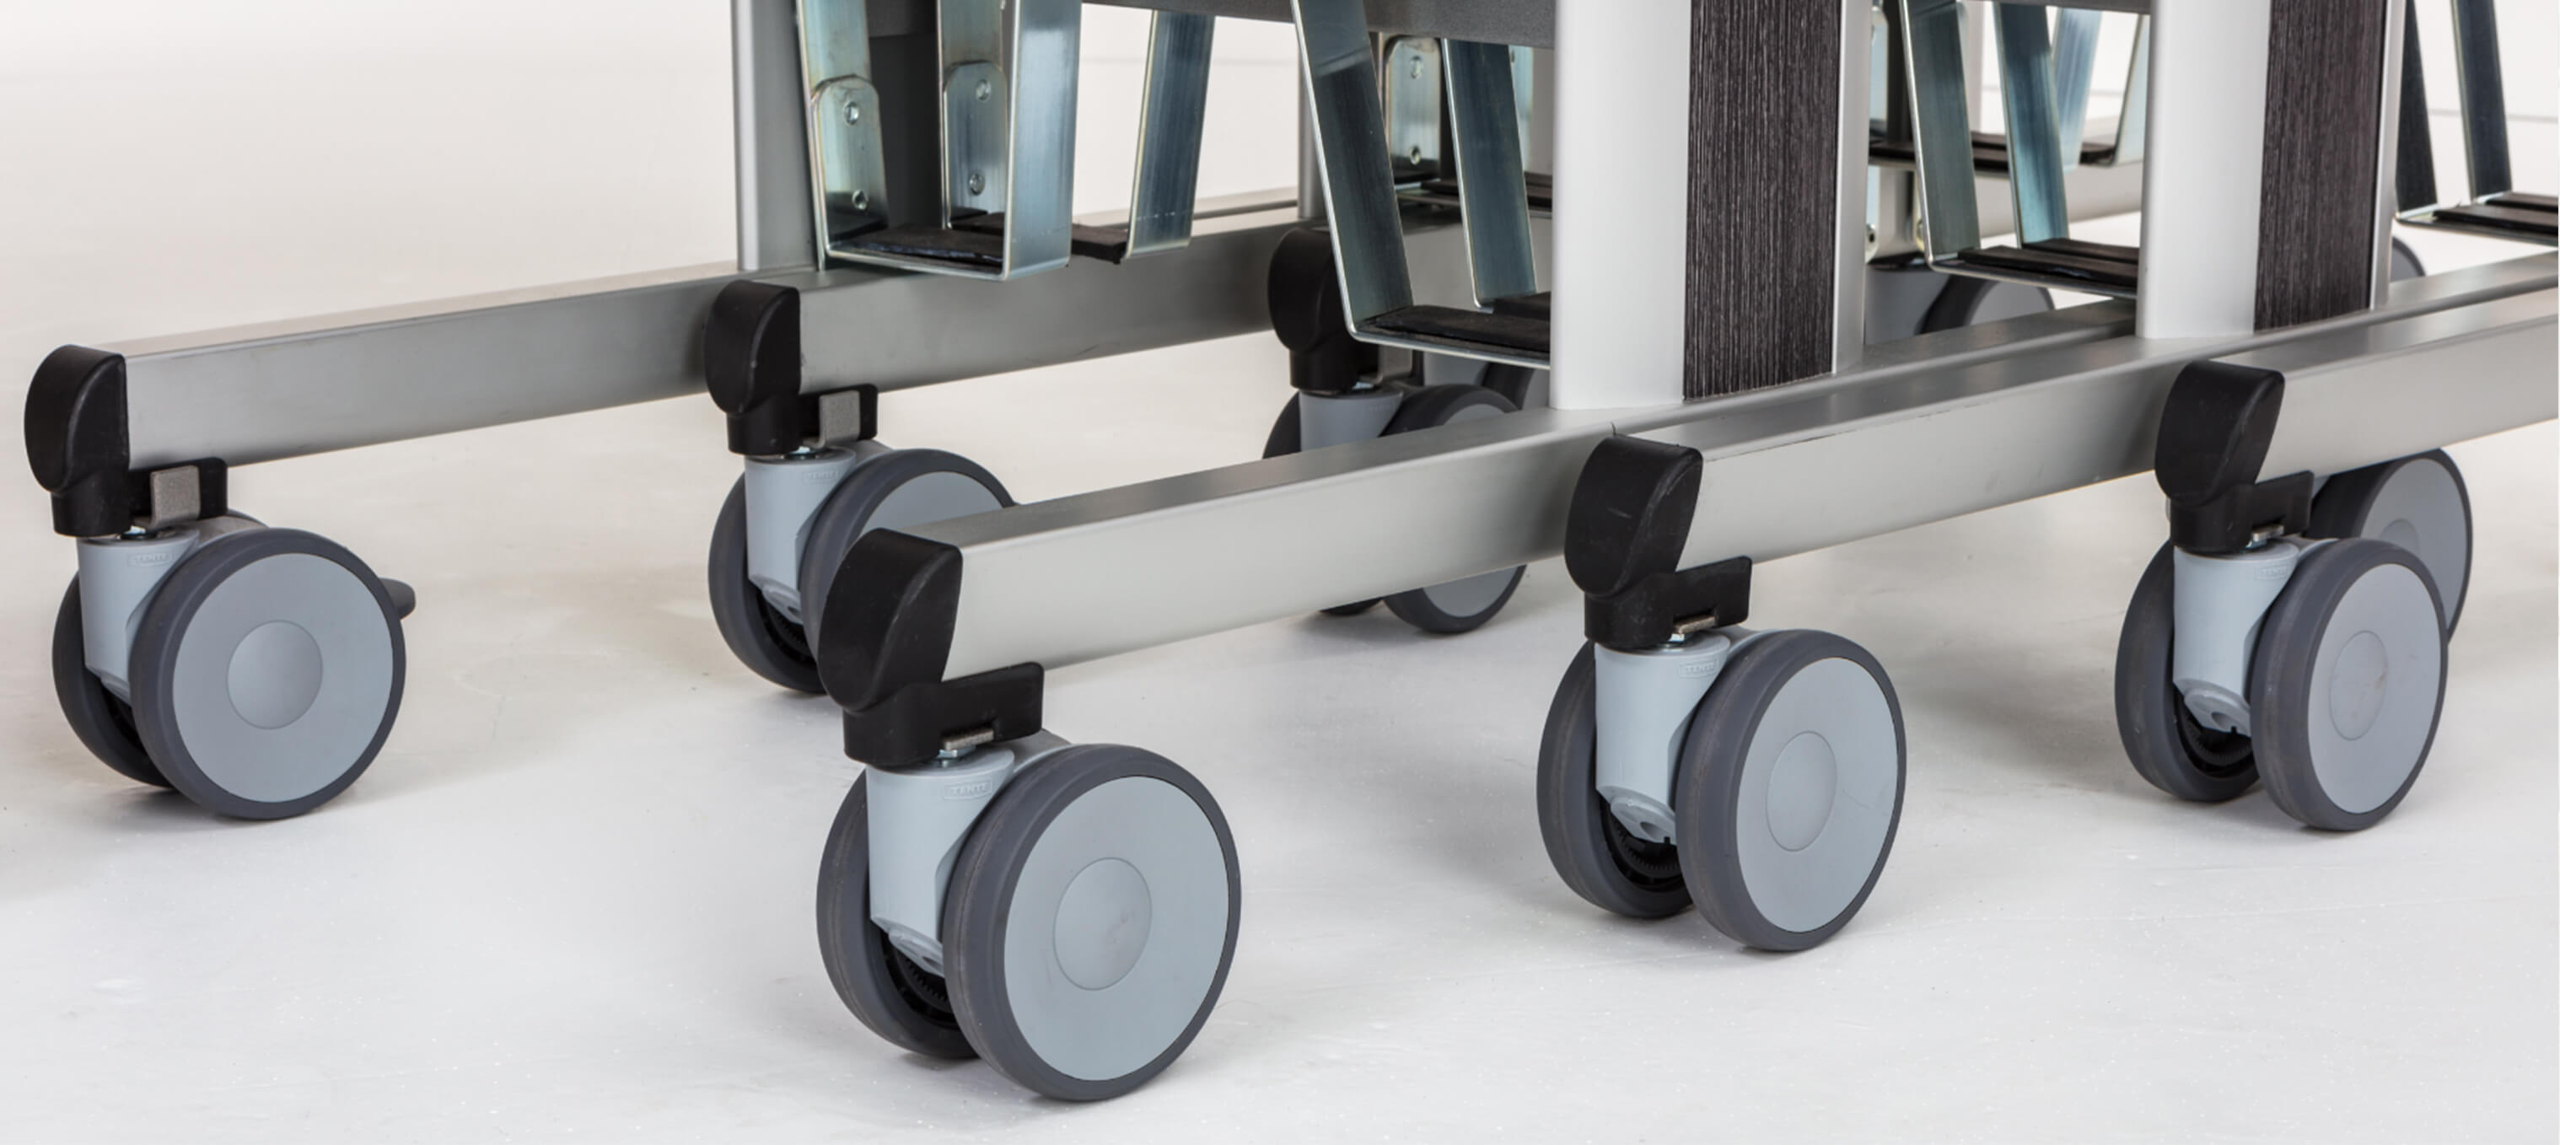 Room Service Trolley Zoom of Wheels